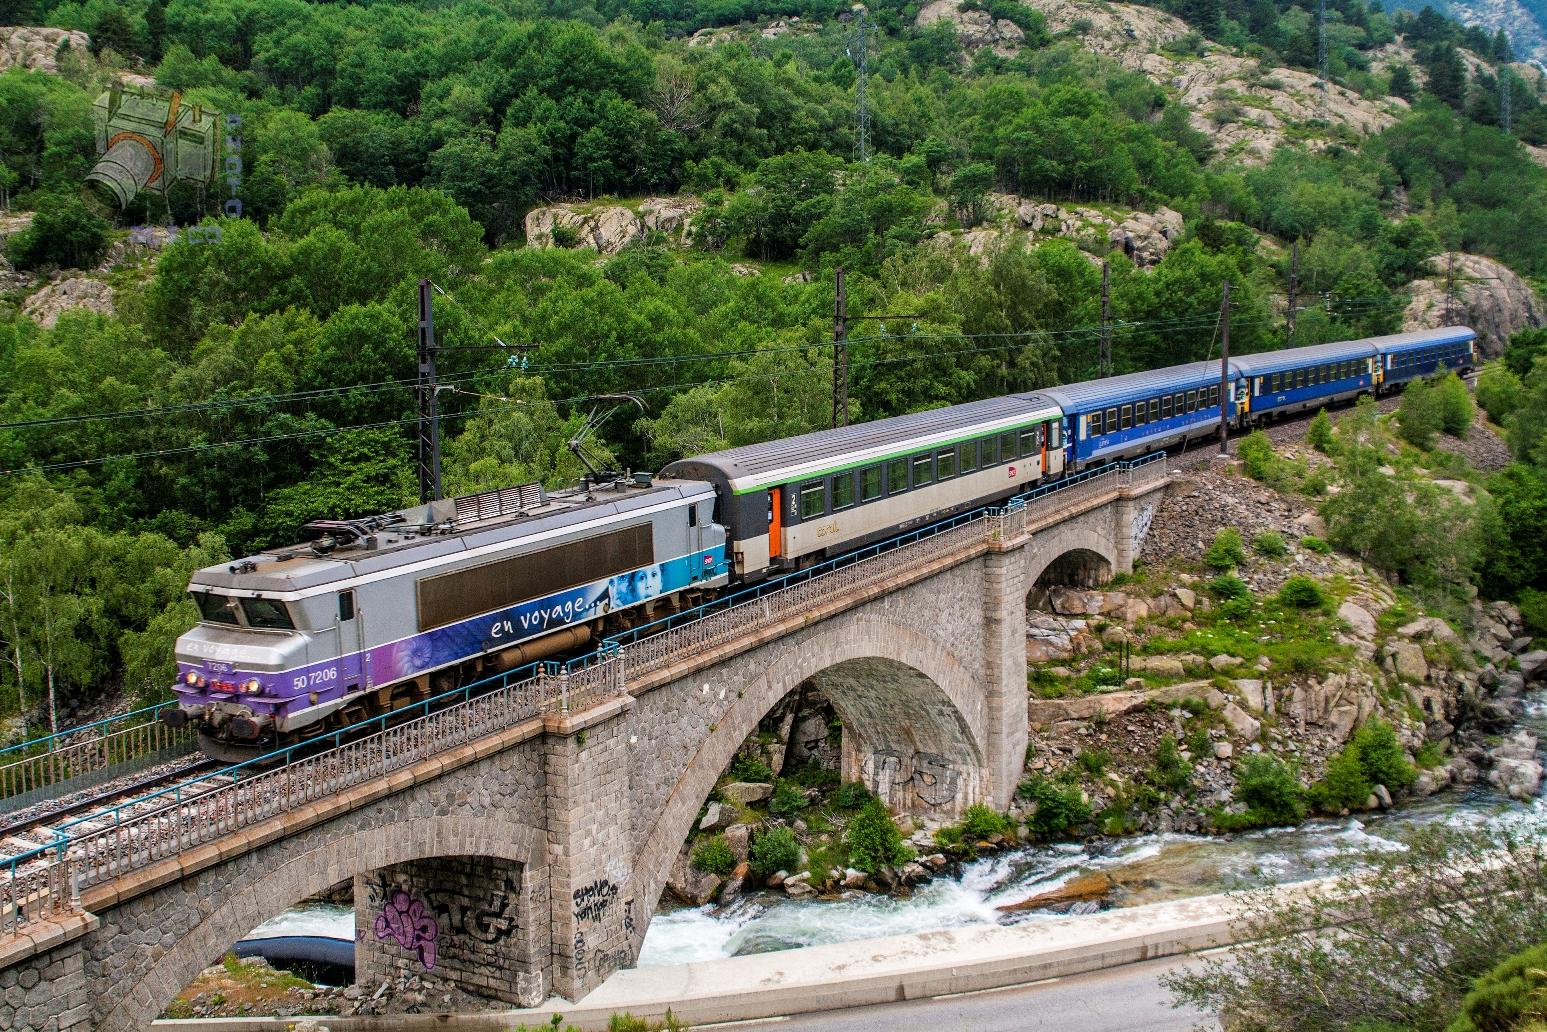 Nachttrein onderweg in de Pyreneeën ©Aleix Cortés